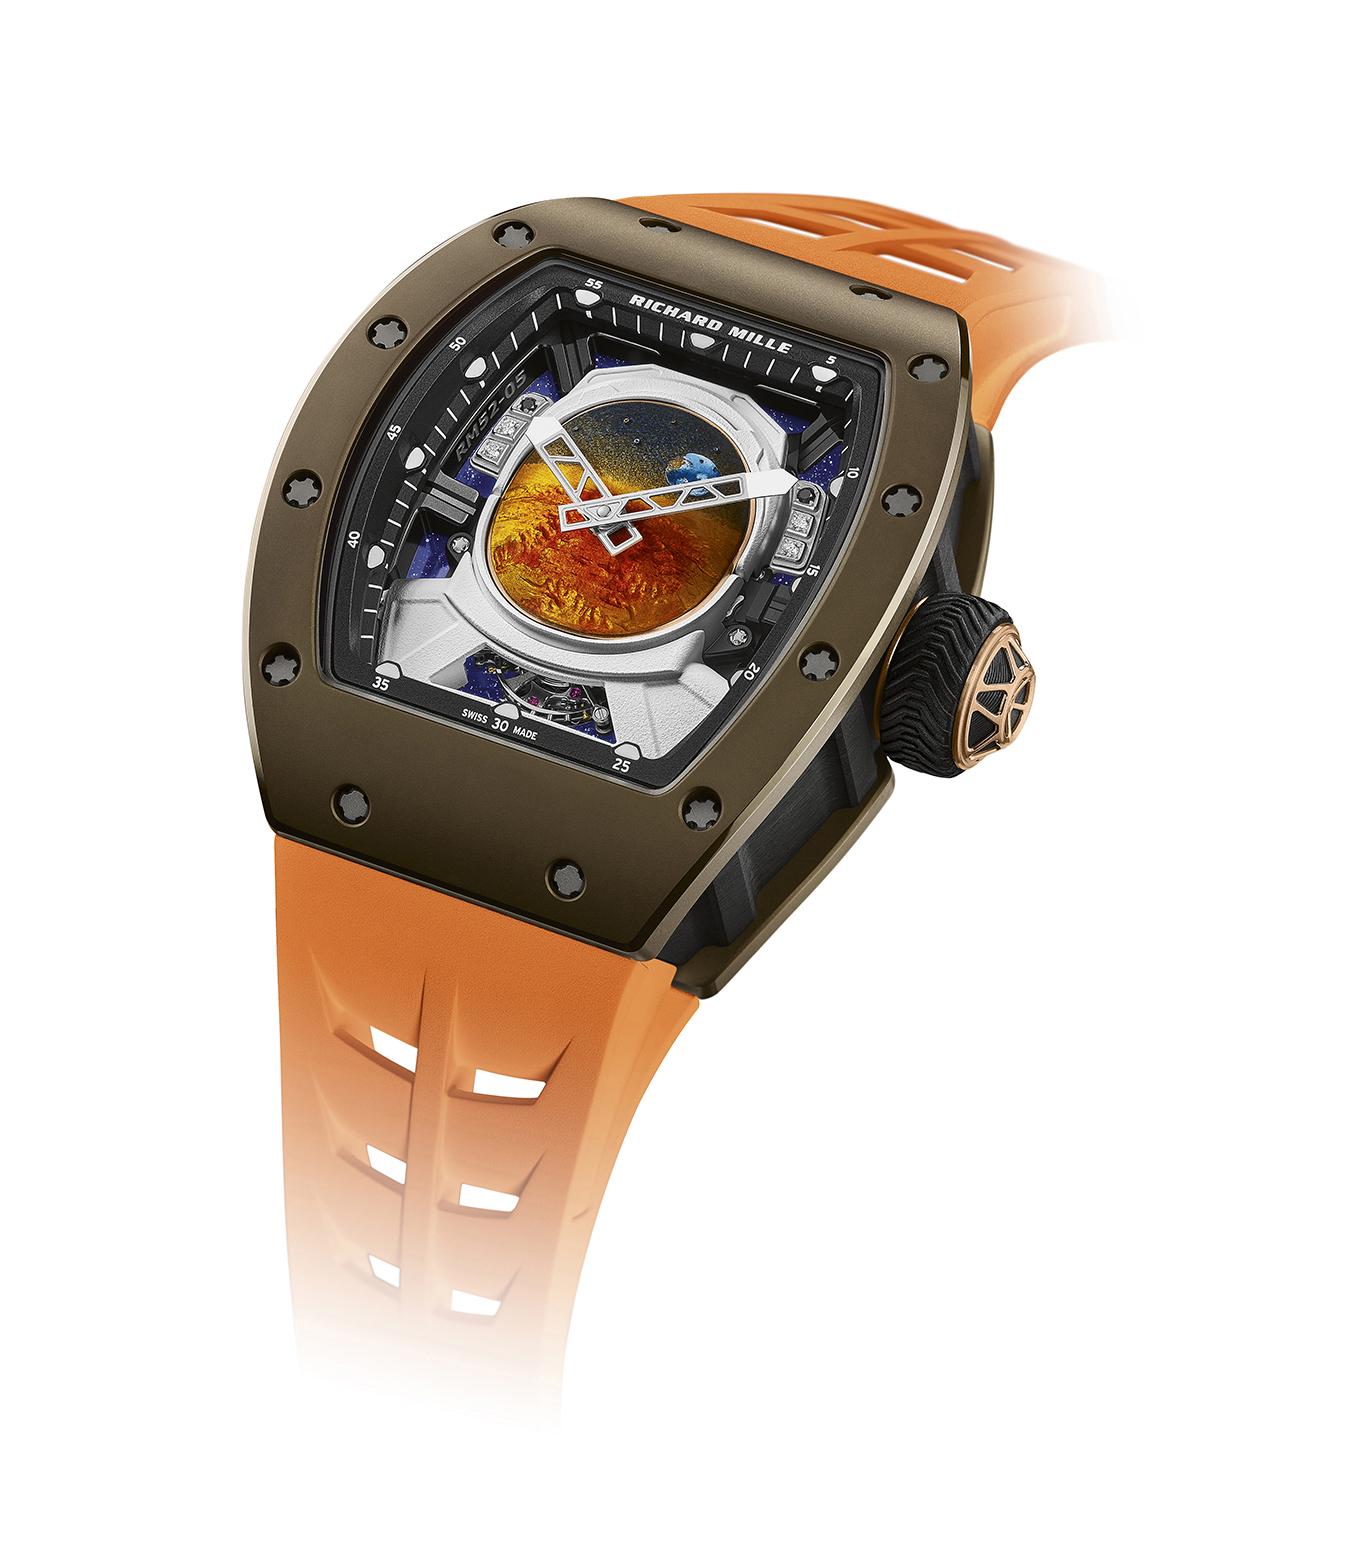 richard-mille-x-pharrell-williams-colab-orologio-cinturino-arancione